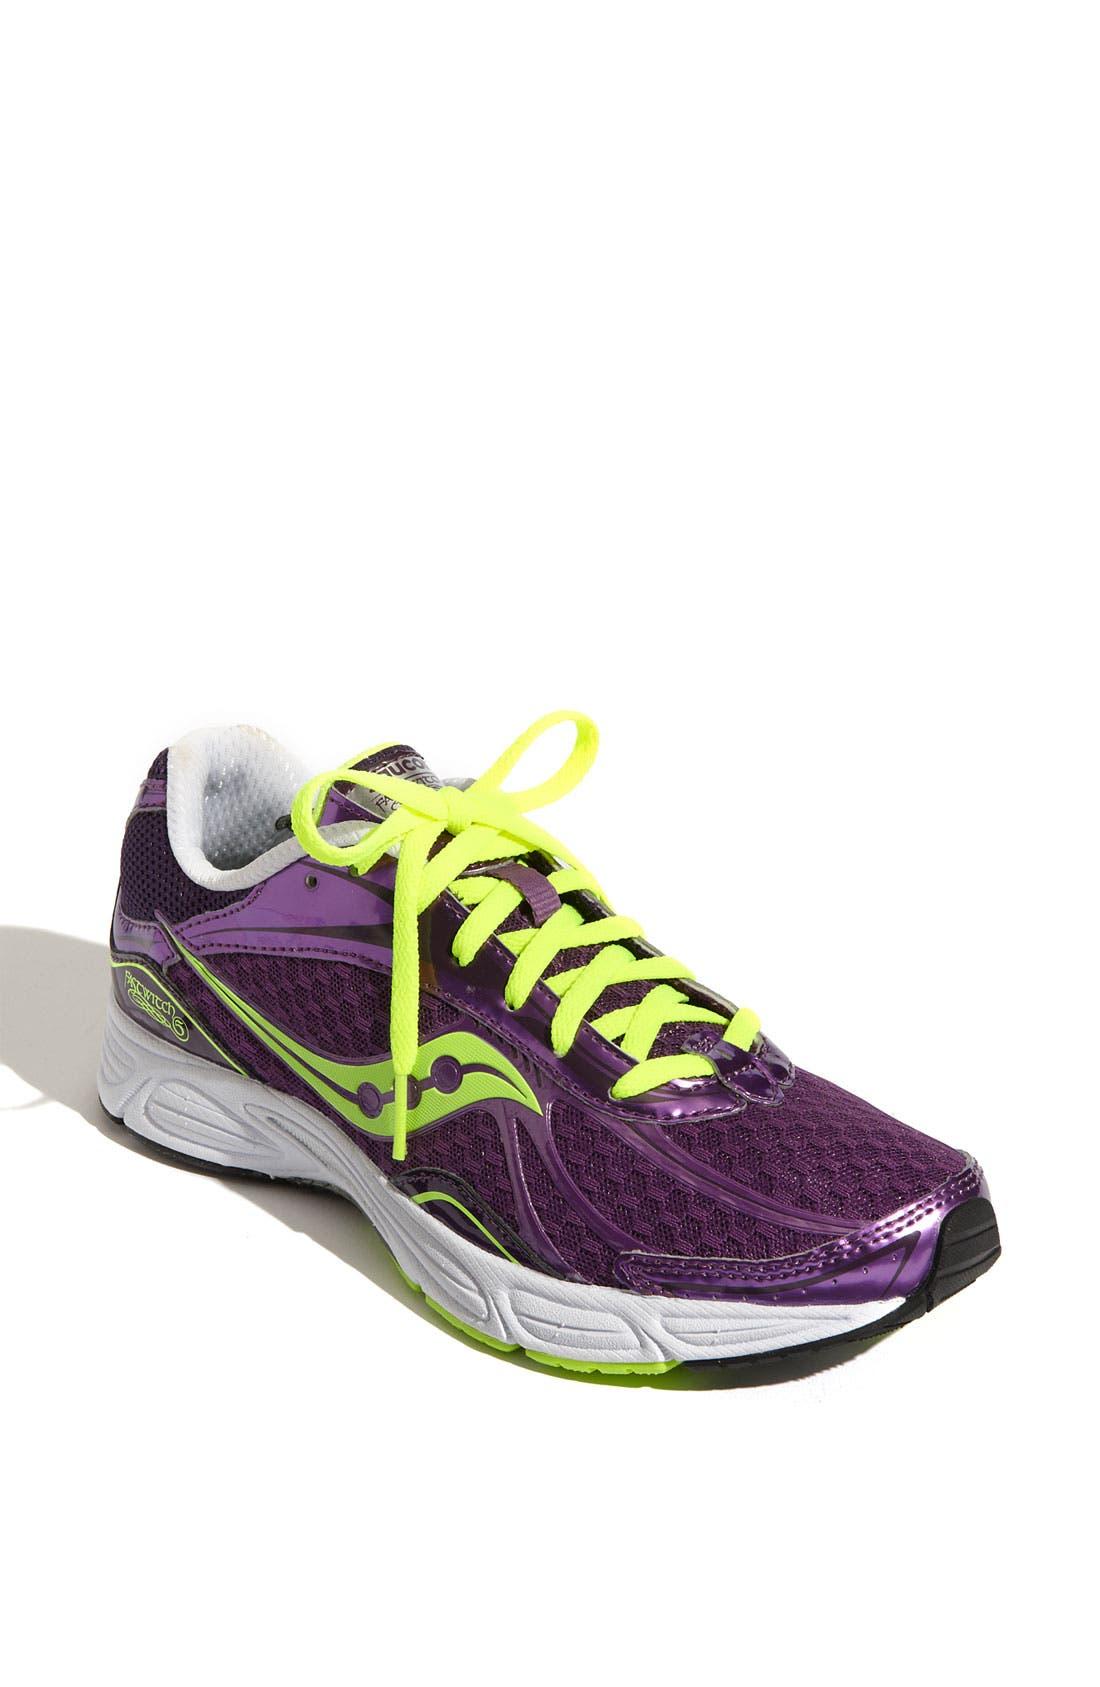 Main Image - Saucony 'Grid Fastwitch 5' Running Shoe (Women)